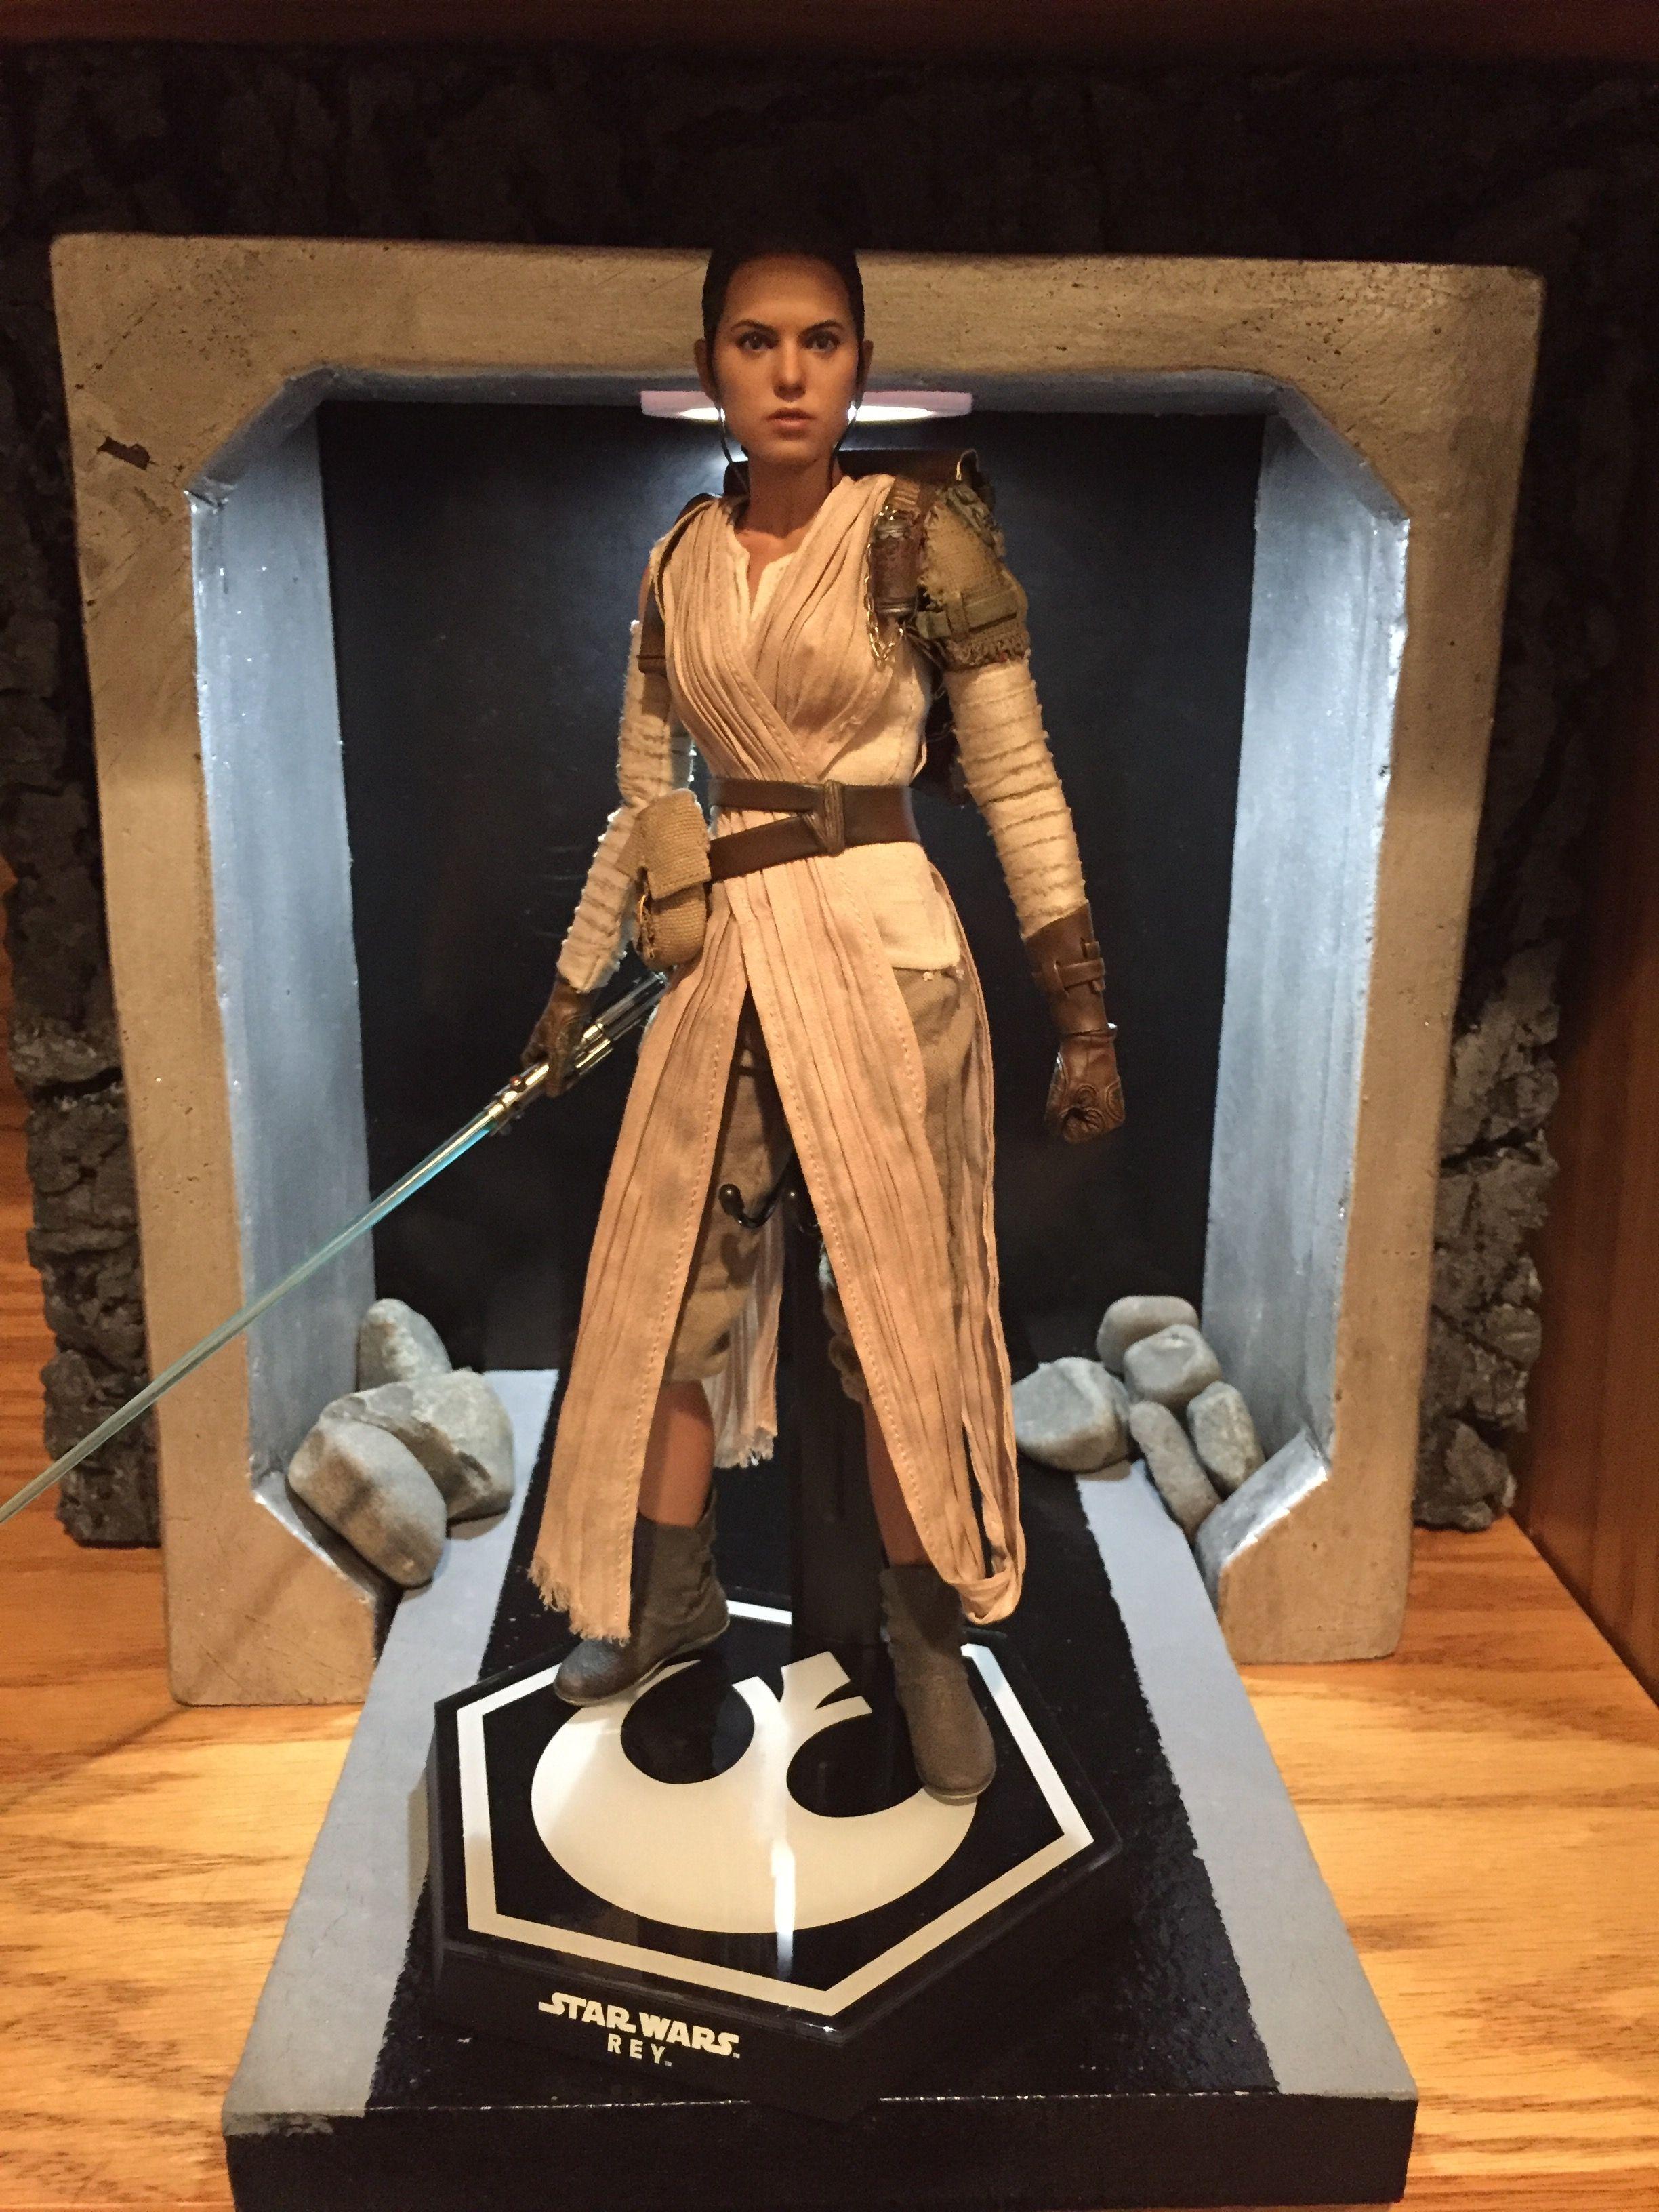 Hot Toys Rey Force Awakens Diorama Display Sideshow Collectibles